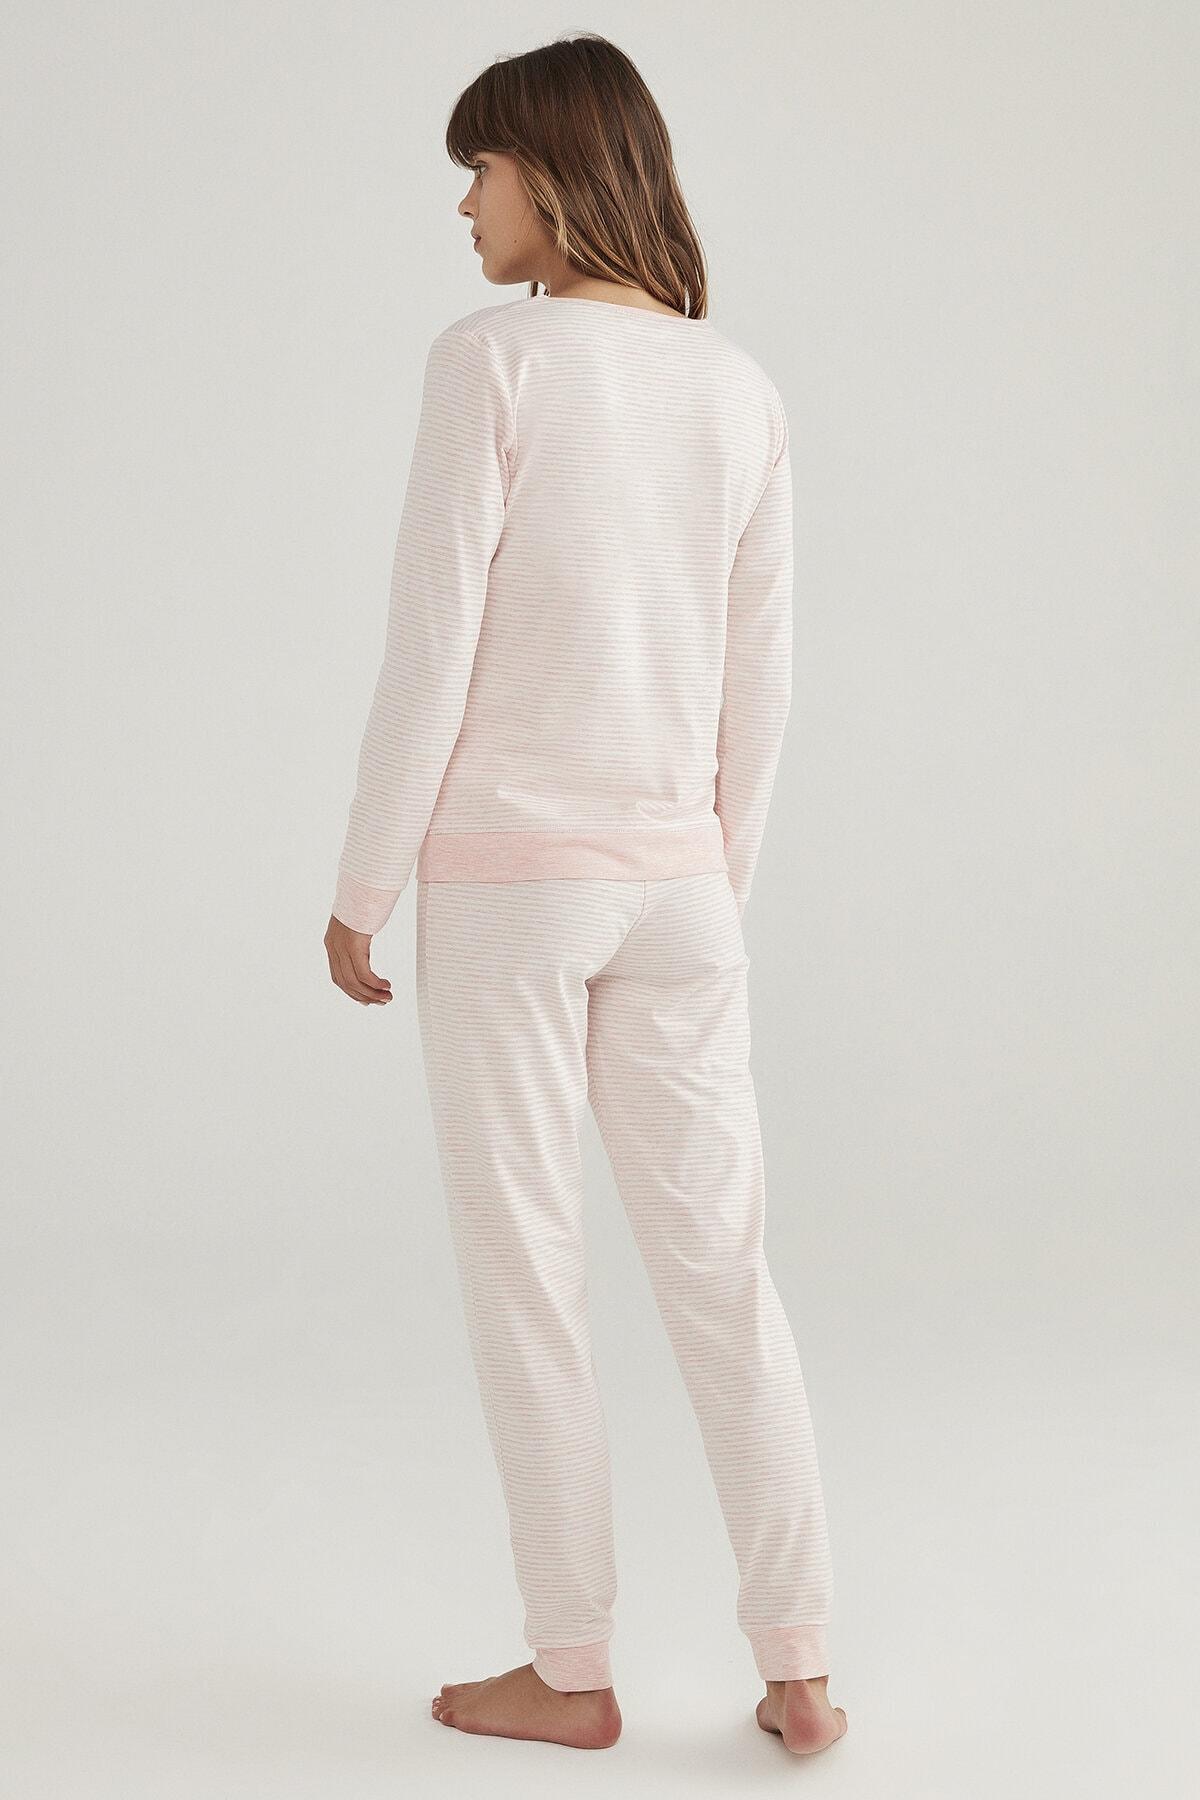 Penti Stripy Pijama Takımı 4